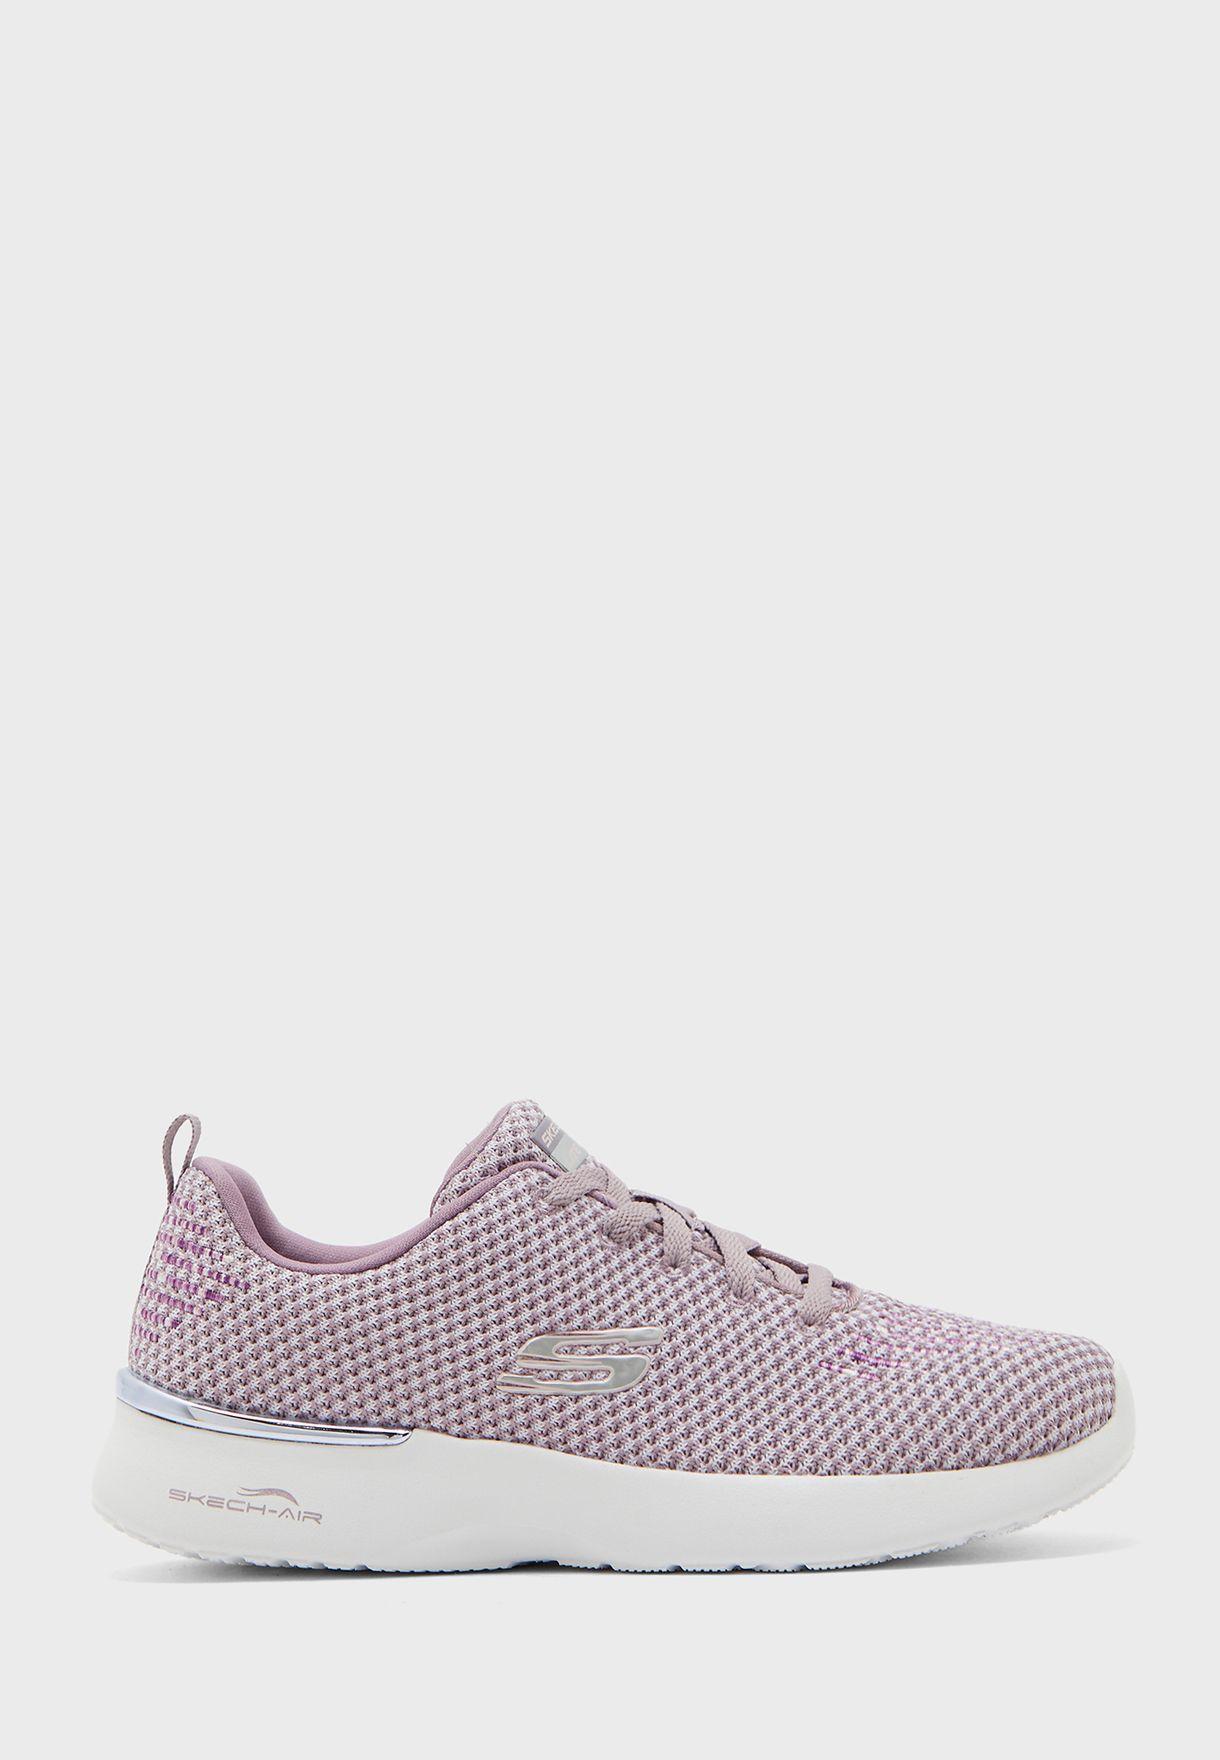 Recuento Criatura No hagas  Buy Skechers purple Dynamight for Women in MENA, Worldwide | 12946-LAV